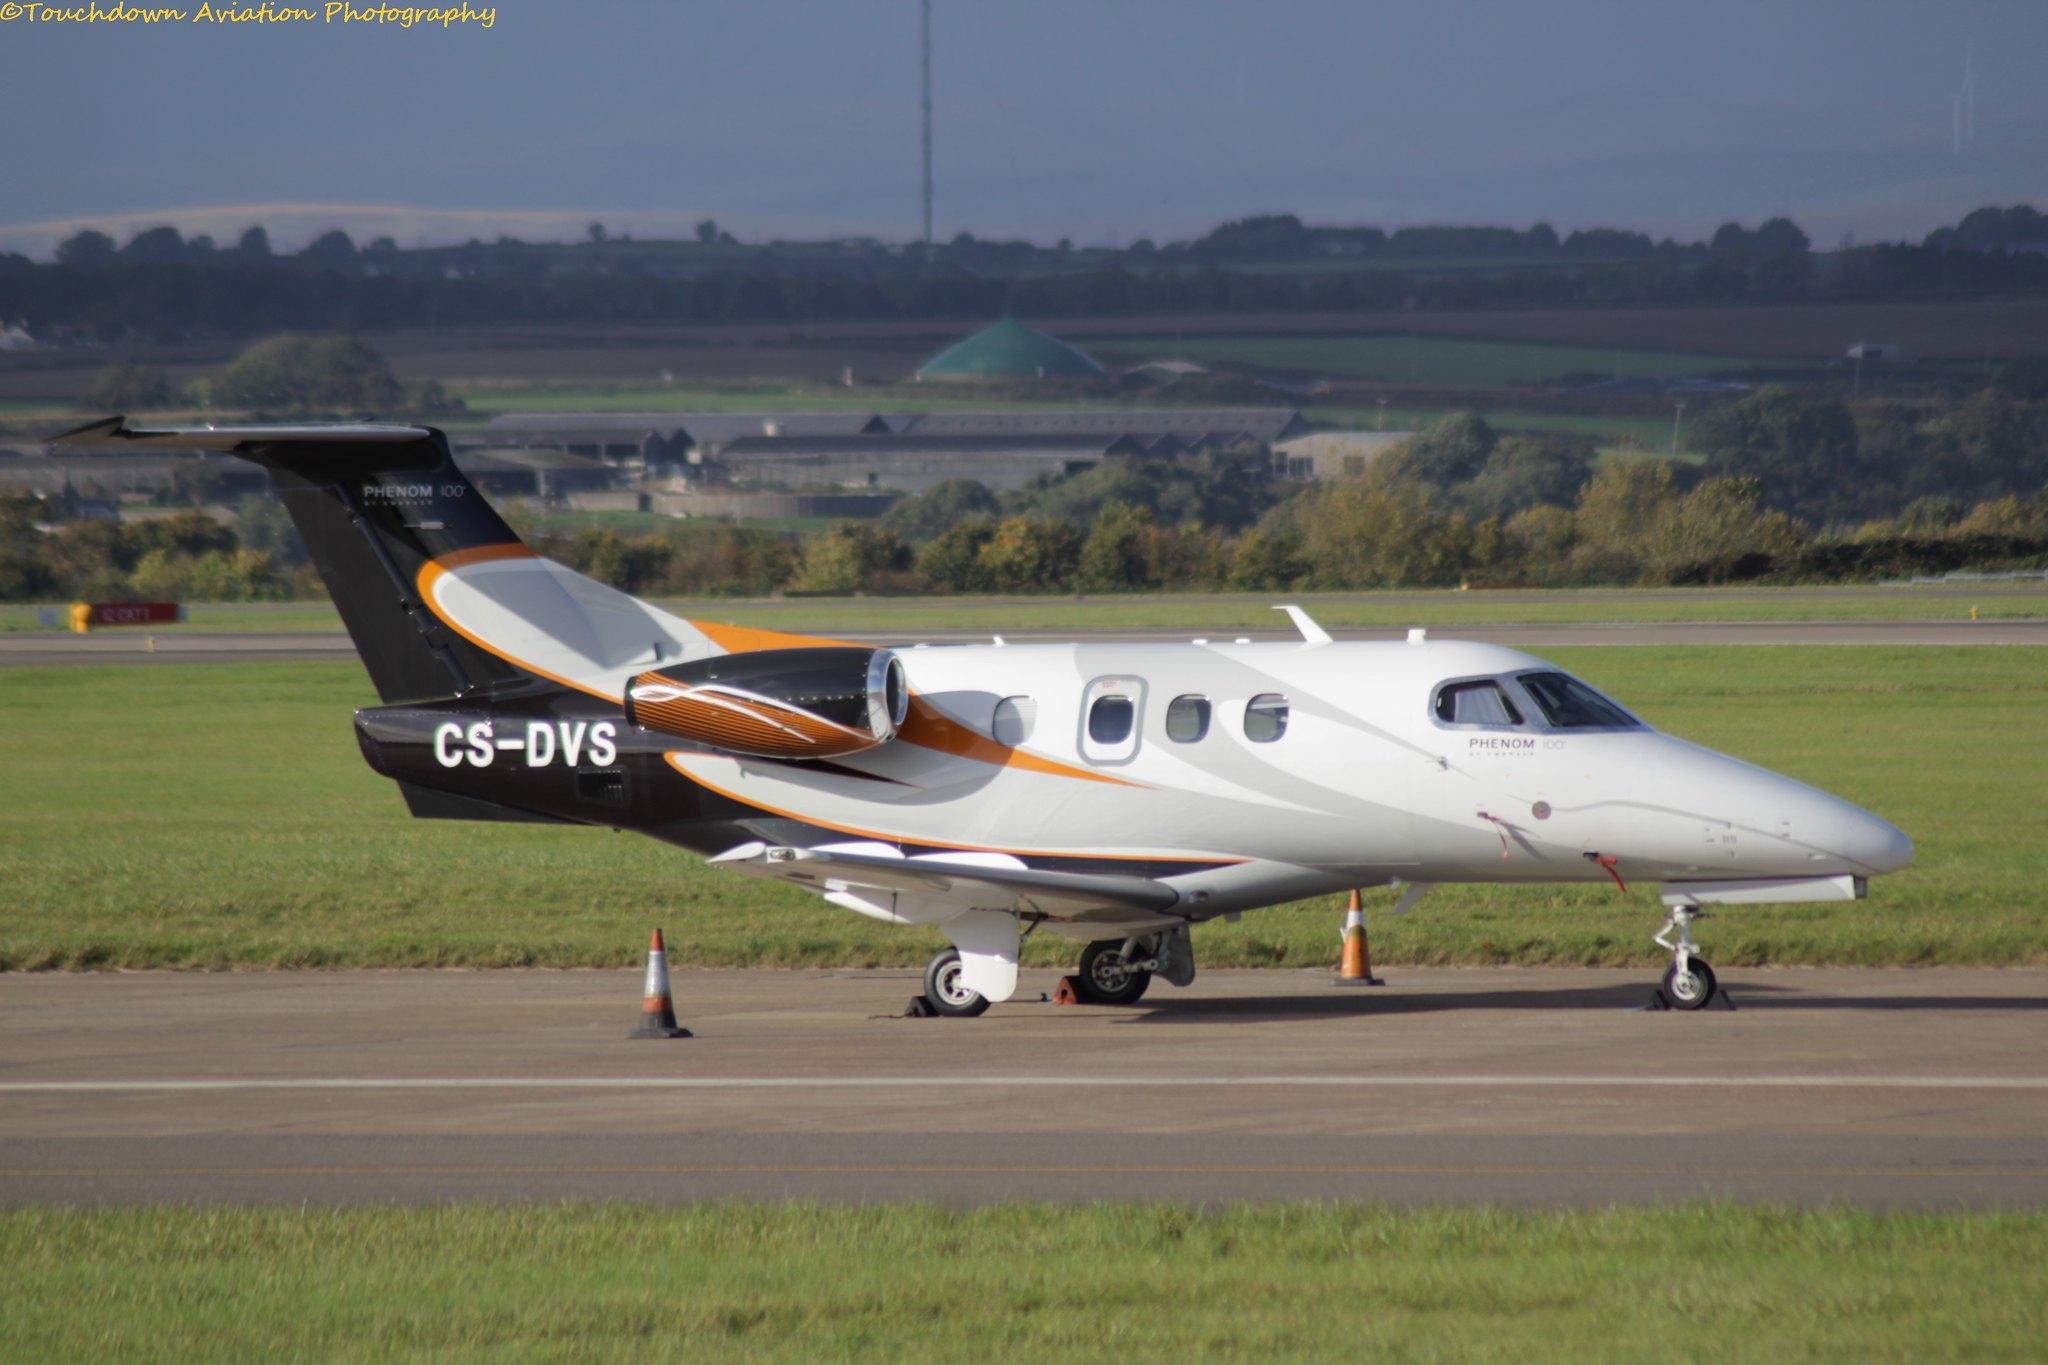 Embraer EMB-500 Phenom 100 CS-DVS 16OCT16